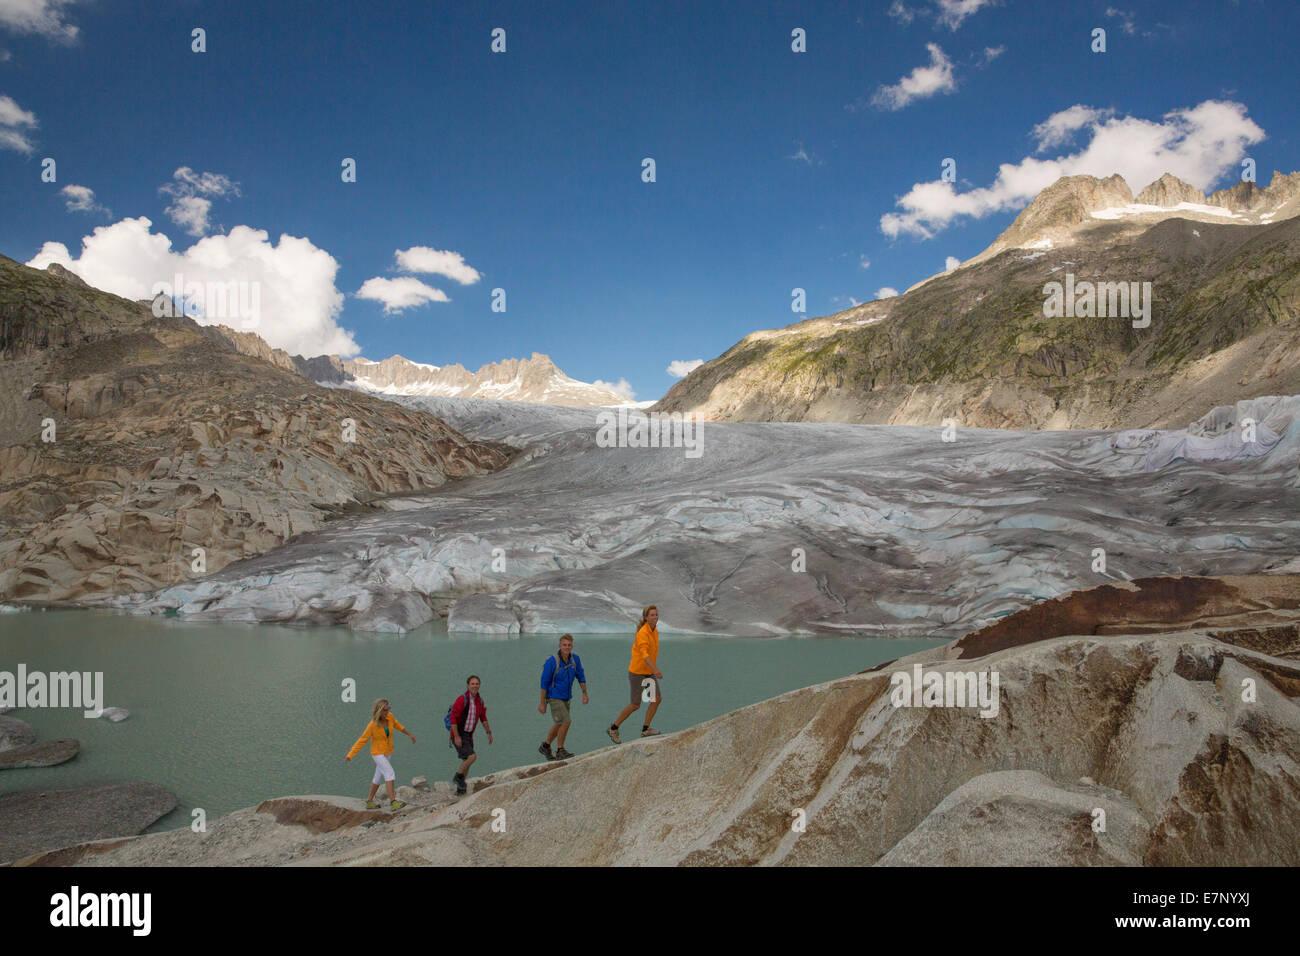 Gletsch VS, walking, hiking, Rhone glacier, Furka Pass, canton, VS, Valais, footpath, walking, hiking, glacier, - Stock Image